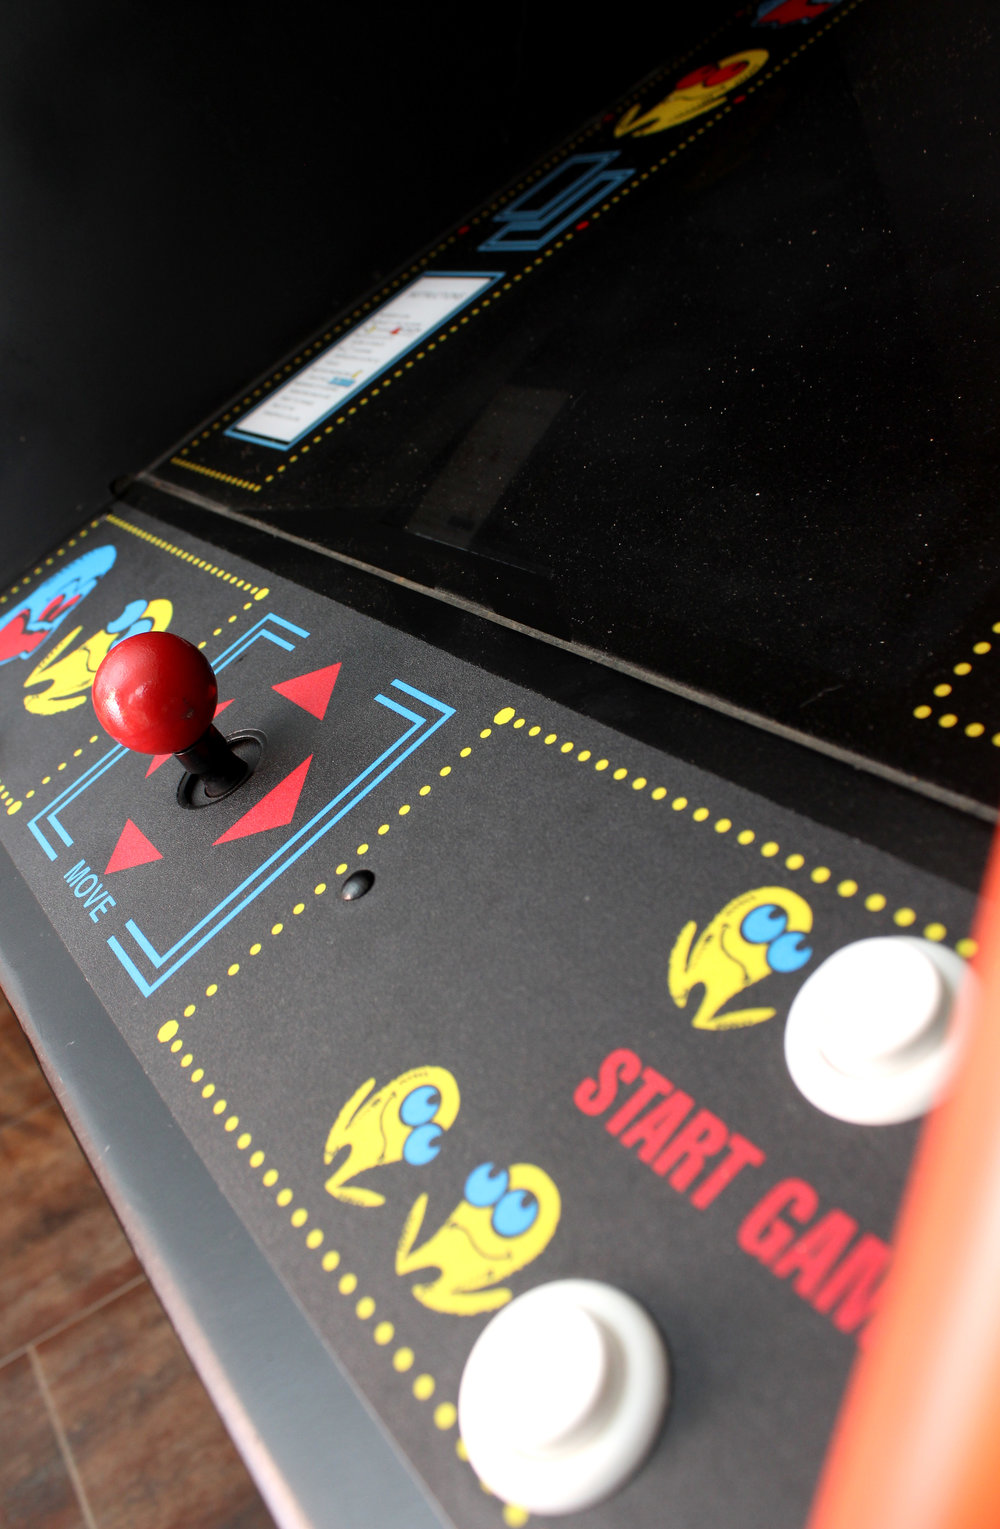 z-pacman-controls.jpg